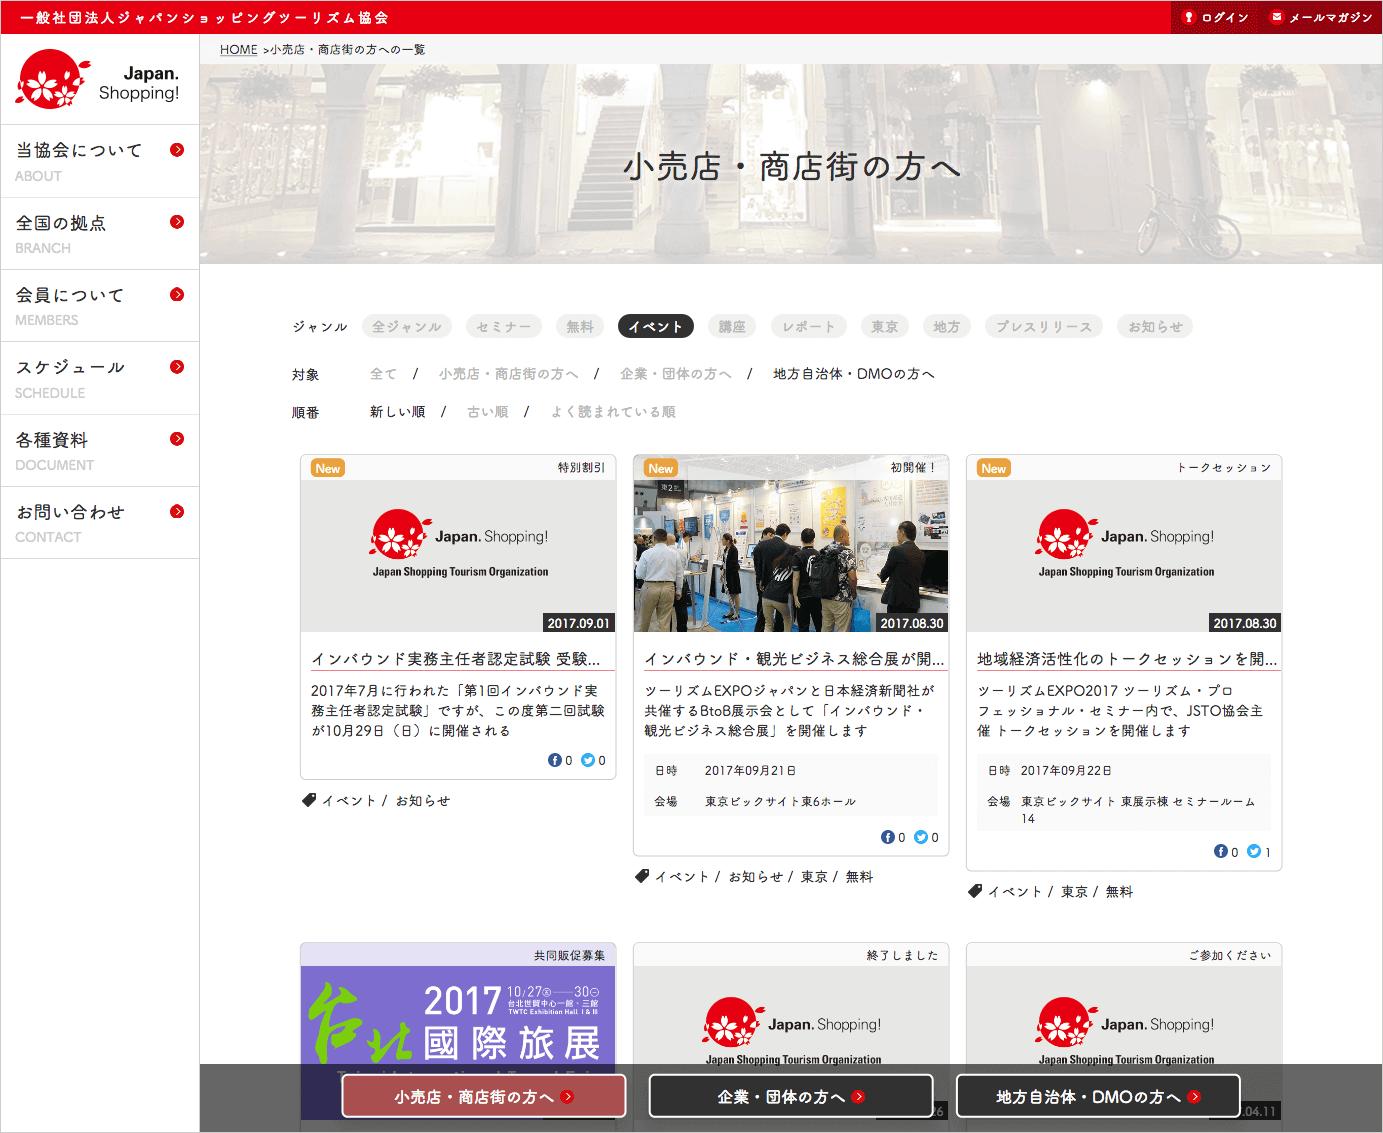 JSTO ウェブサイト制作